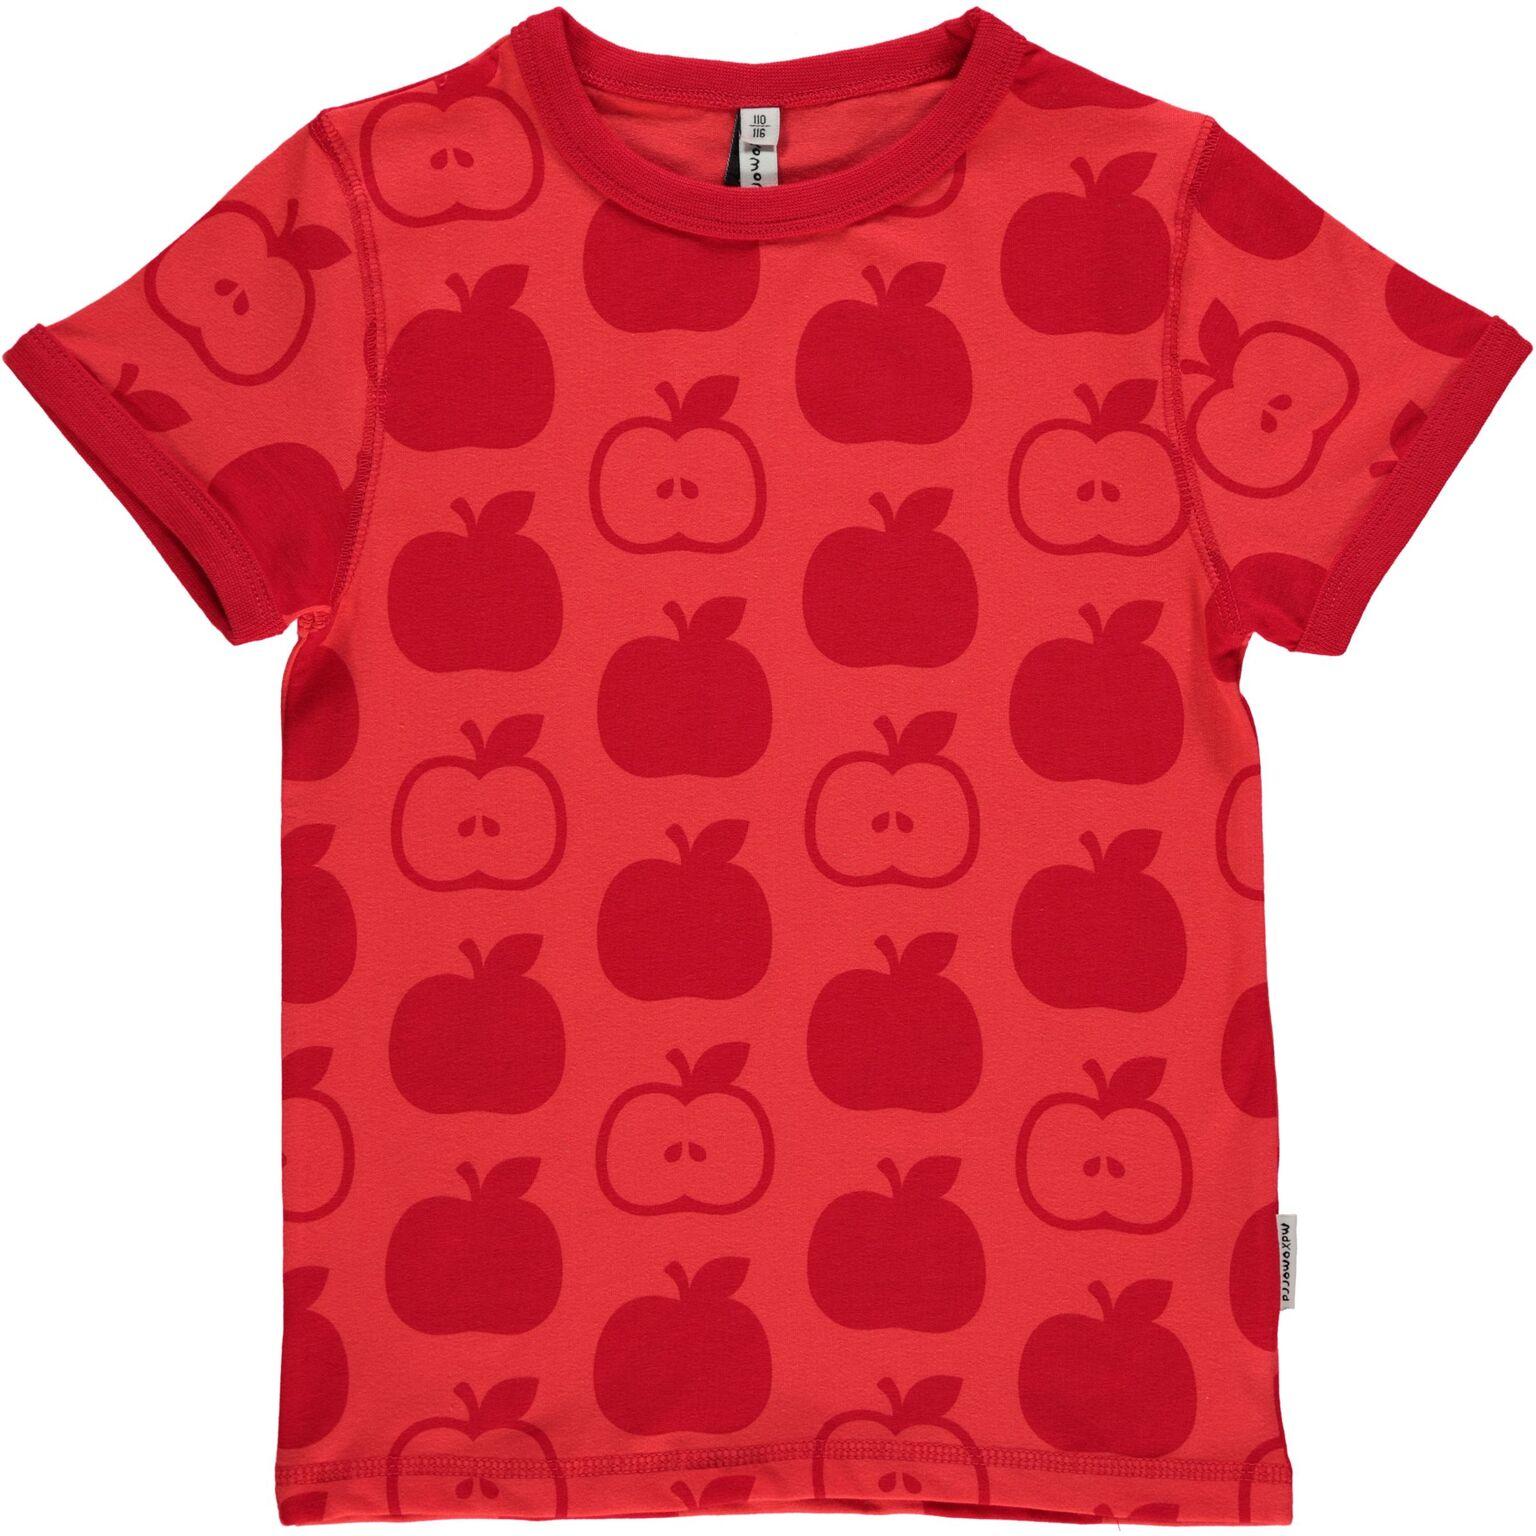 Maxomorra red apple print organic cotton short sleeve t shirt for Organic cotton t shirt printing